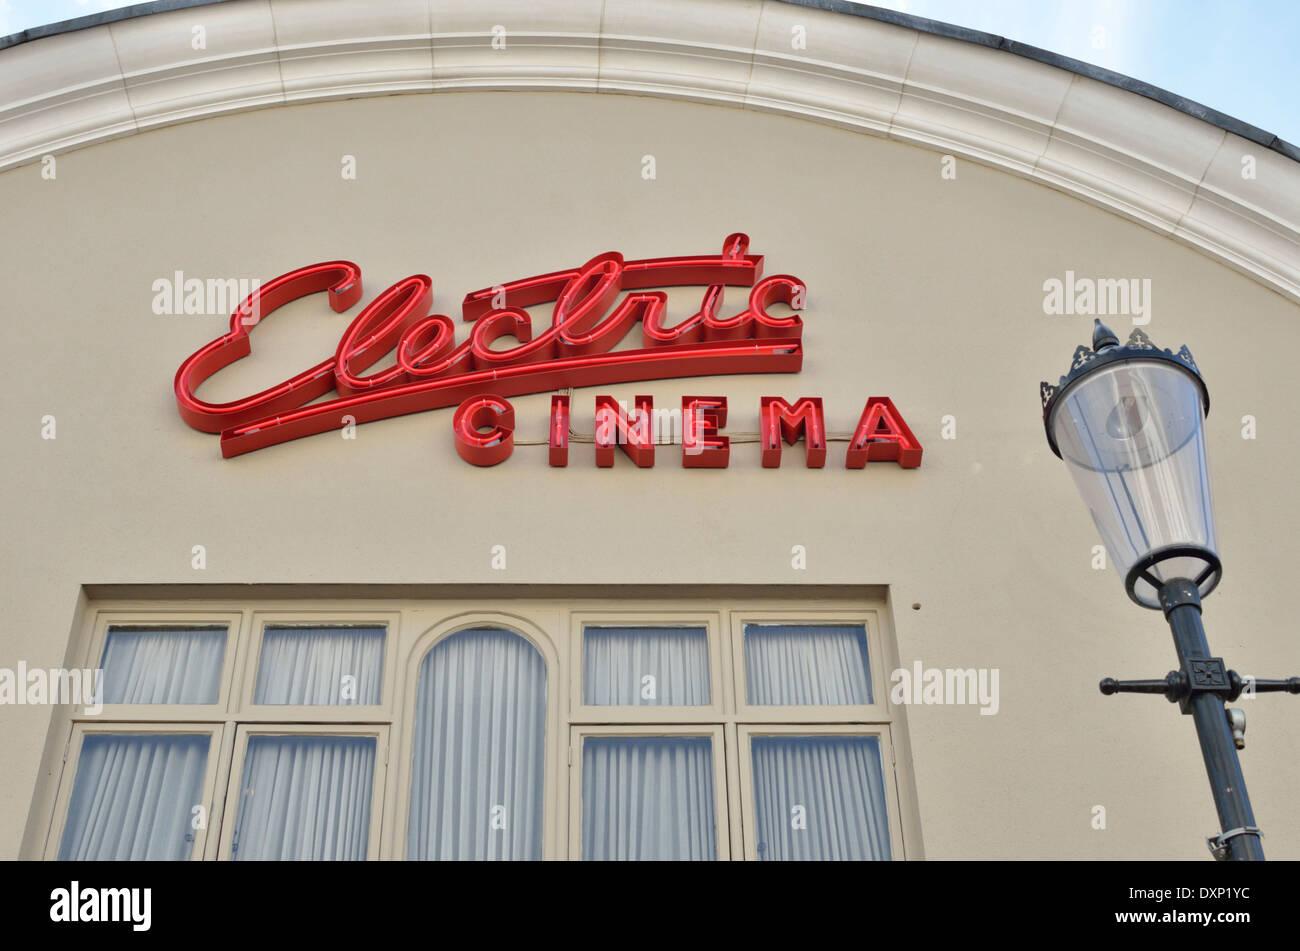 The Electric Cinema in Portobello Road, Notting Hill, London, UK. - Stock Image